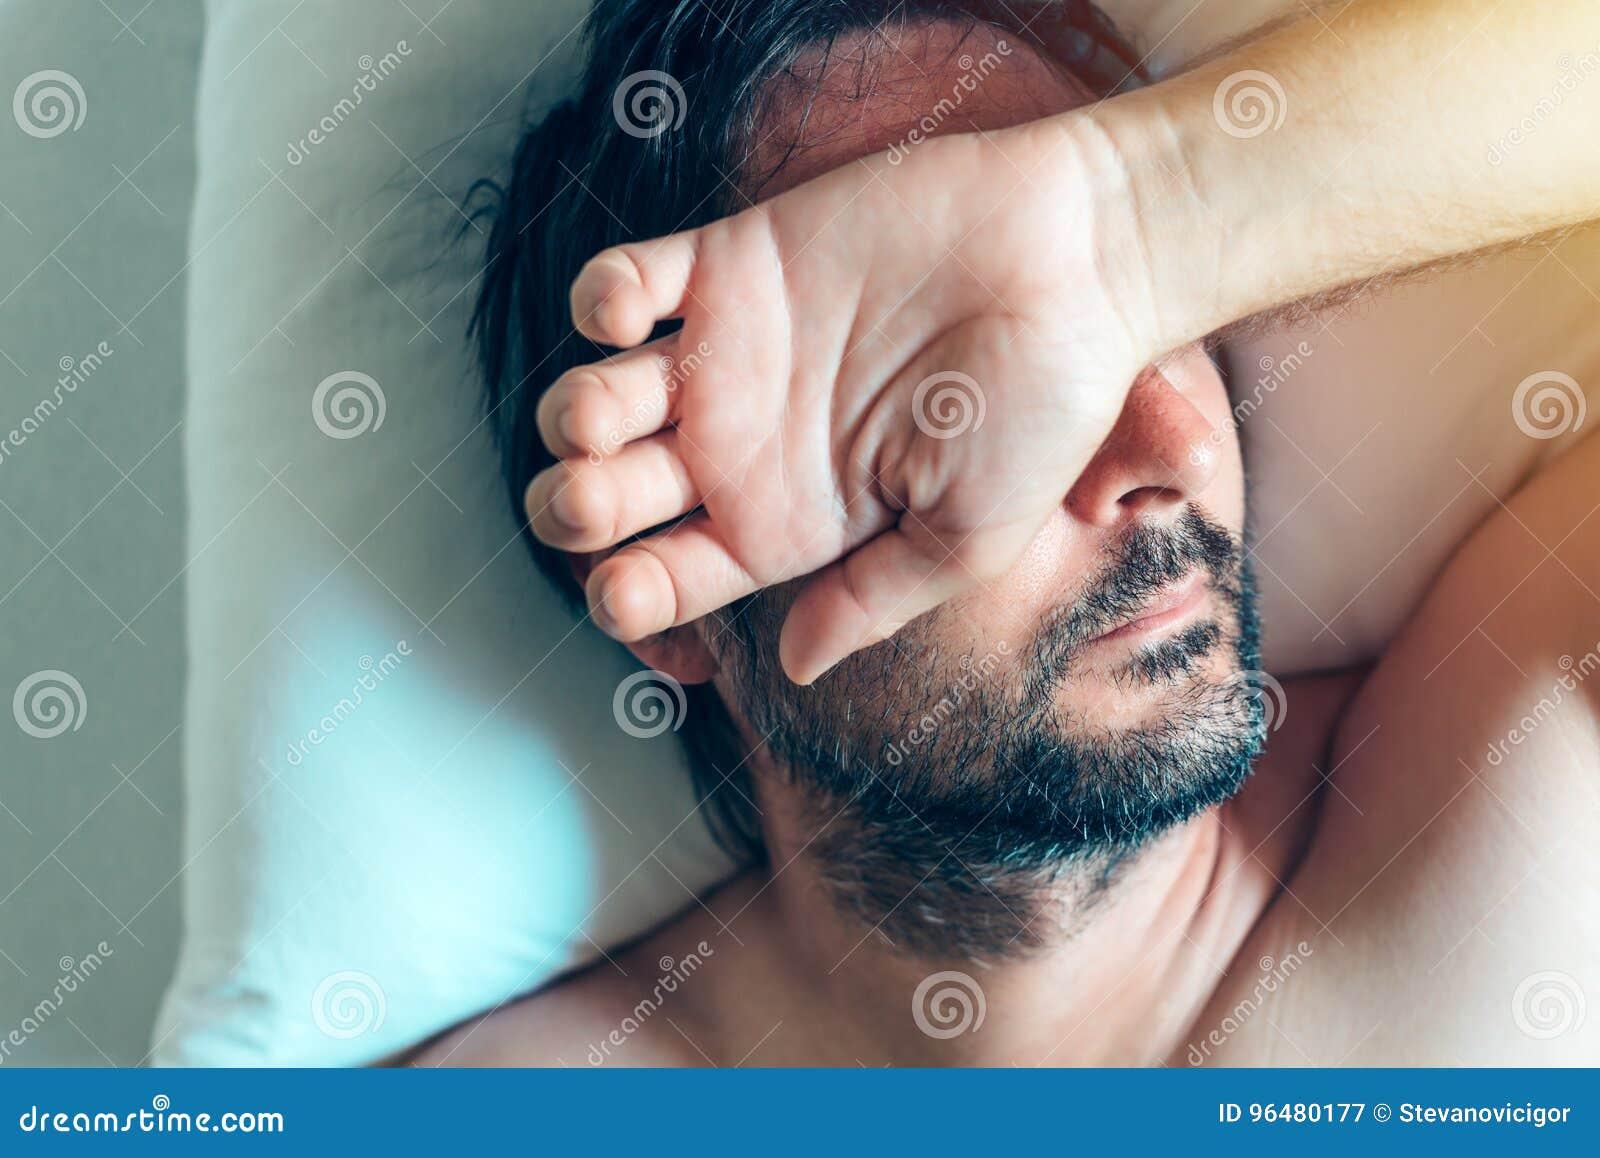 Midlife crisis in men: symptoms 79